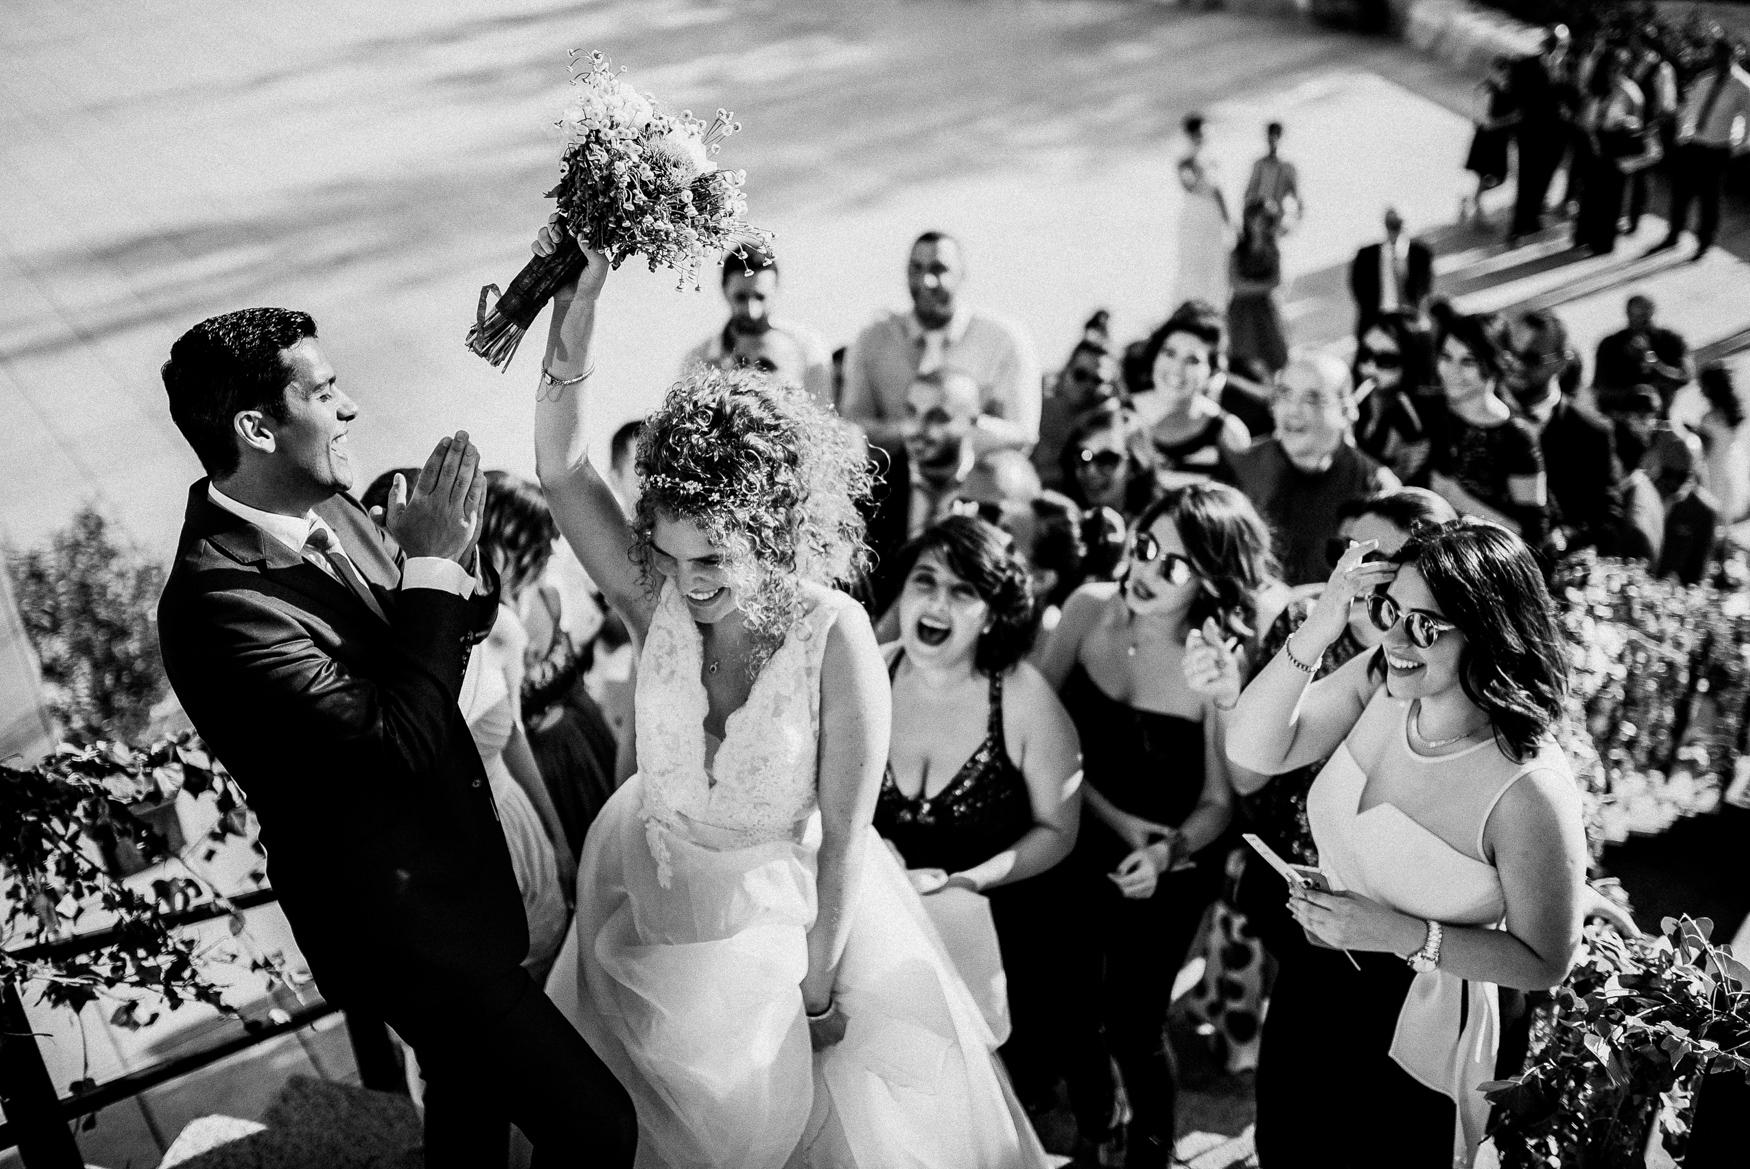 LR5 beirut lebanon mzaar intercontinental wedding photographer 005.jpg